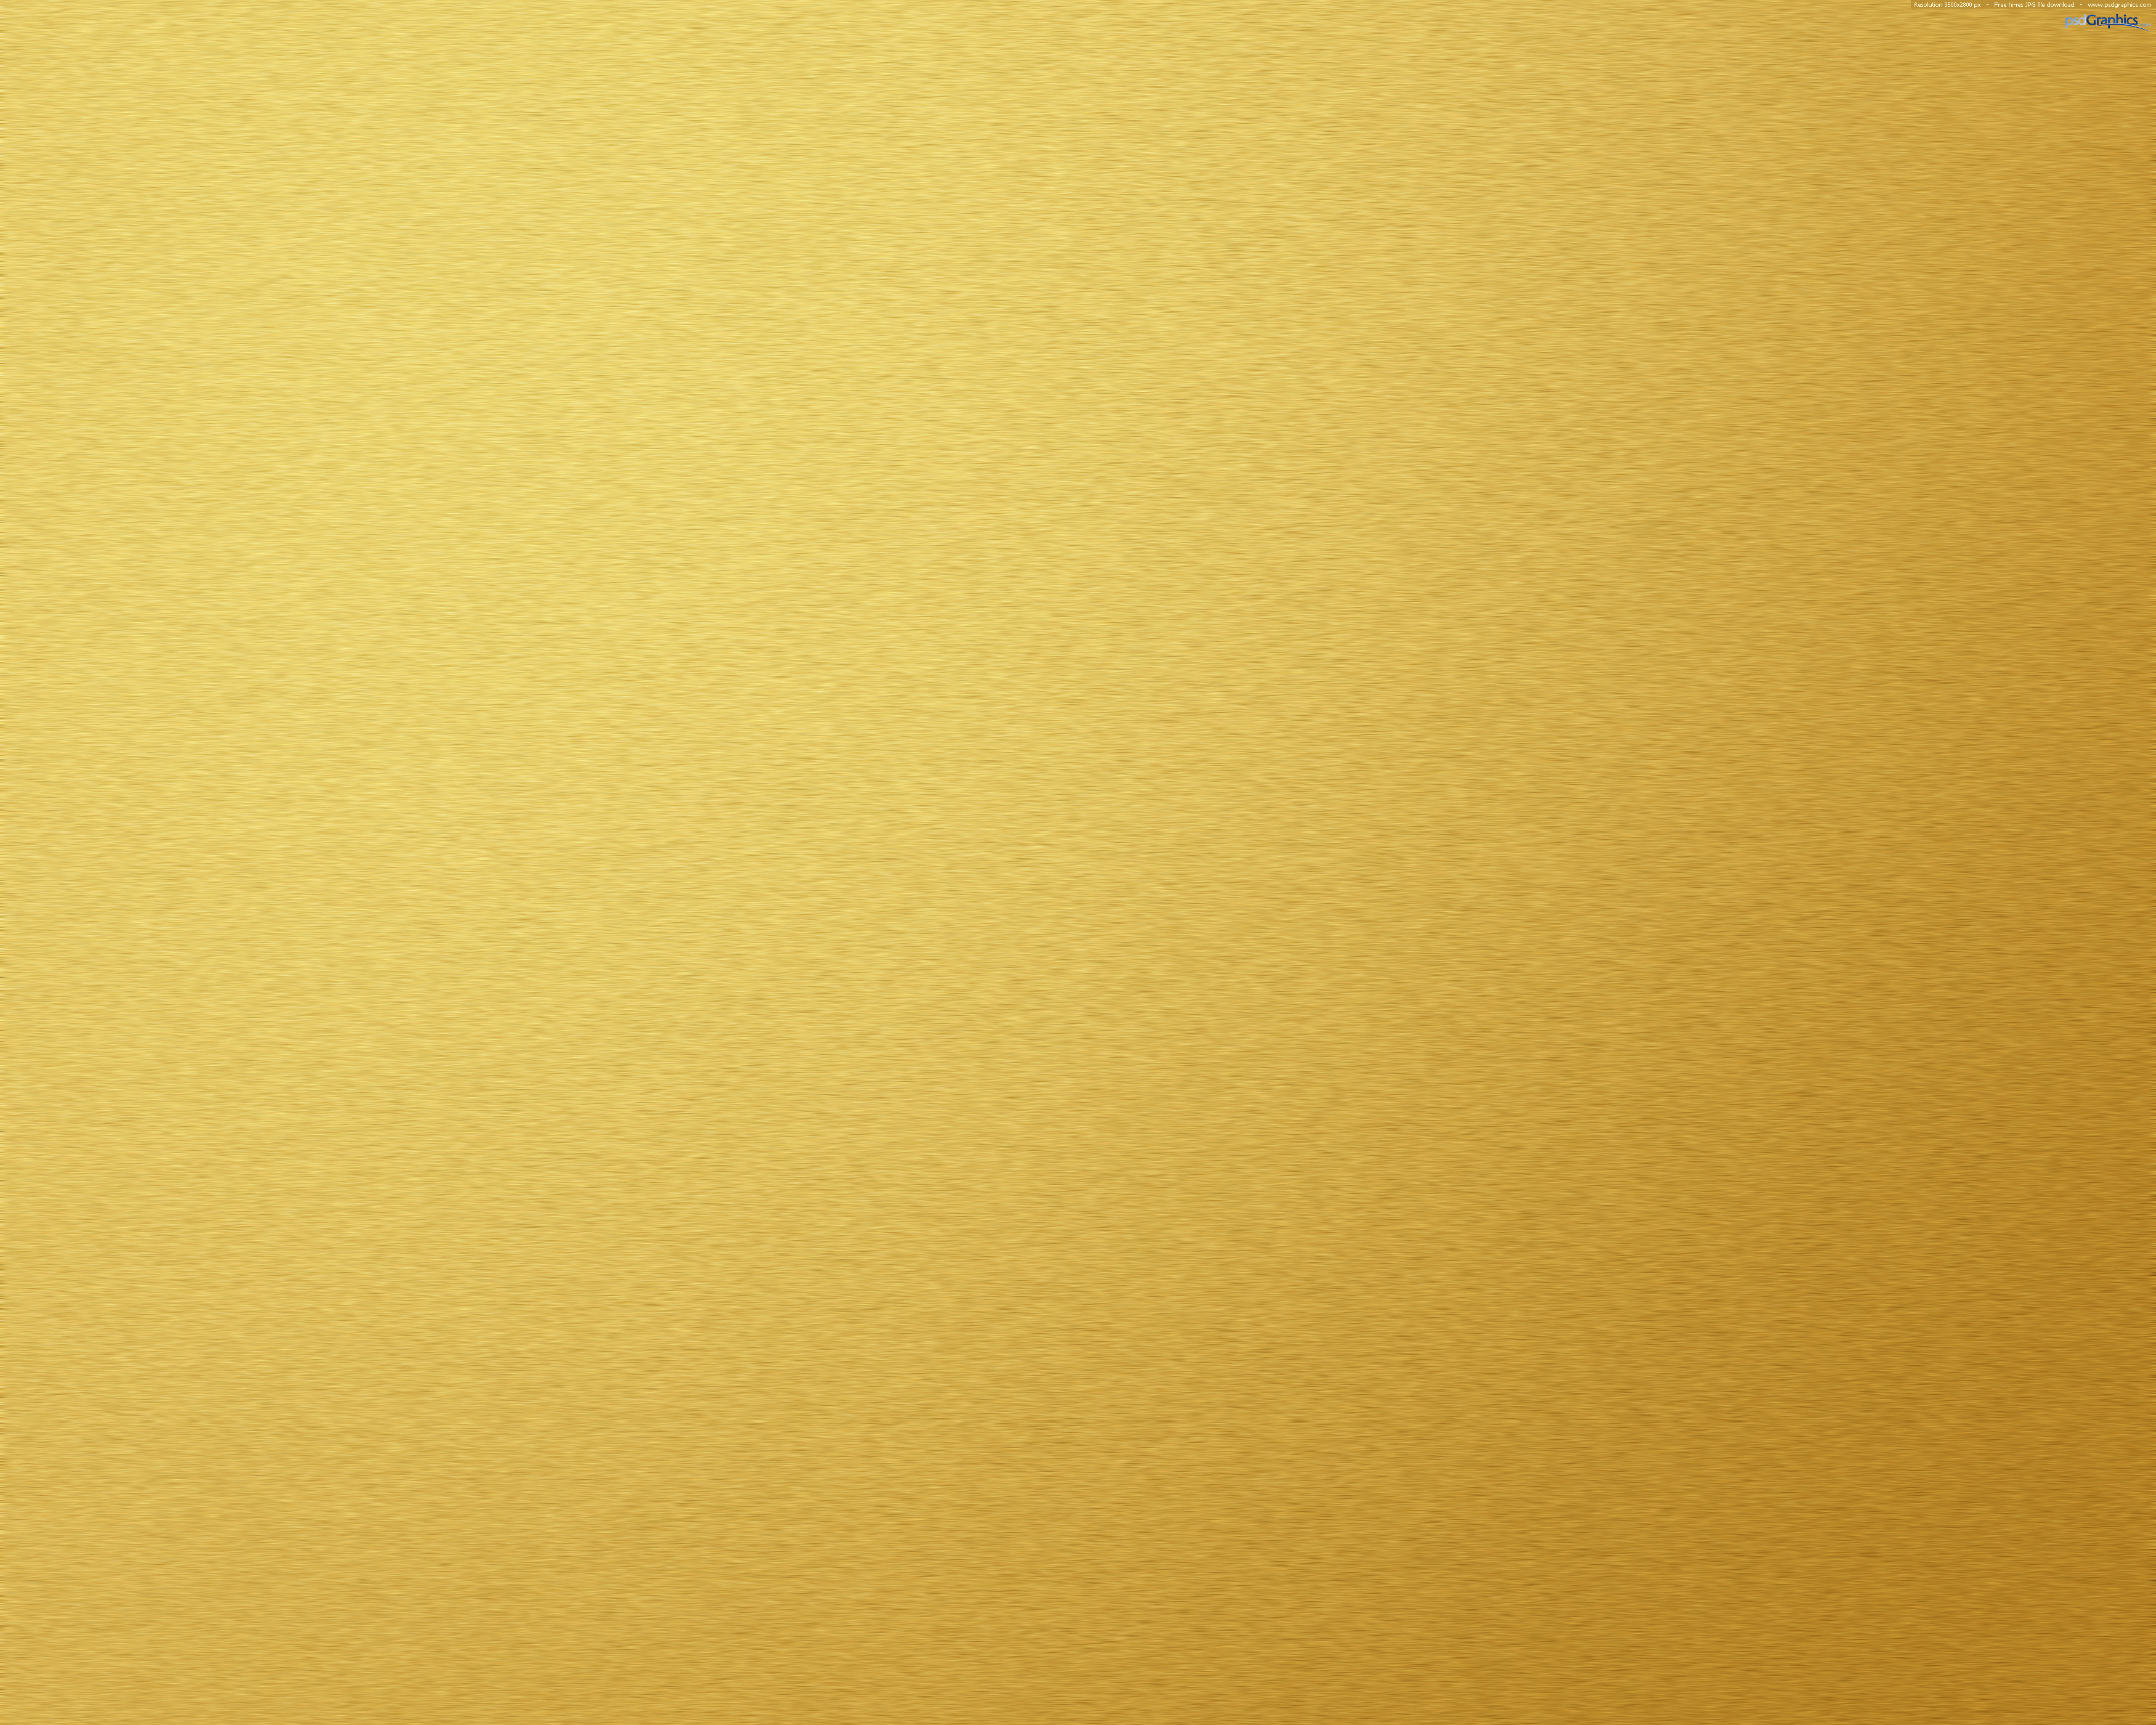 3500x2800 Gold Textures